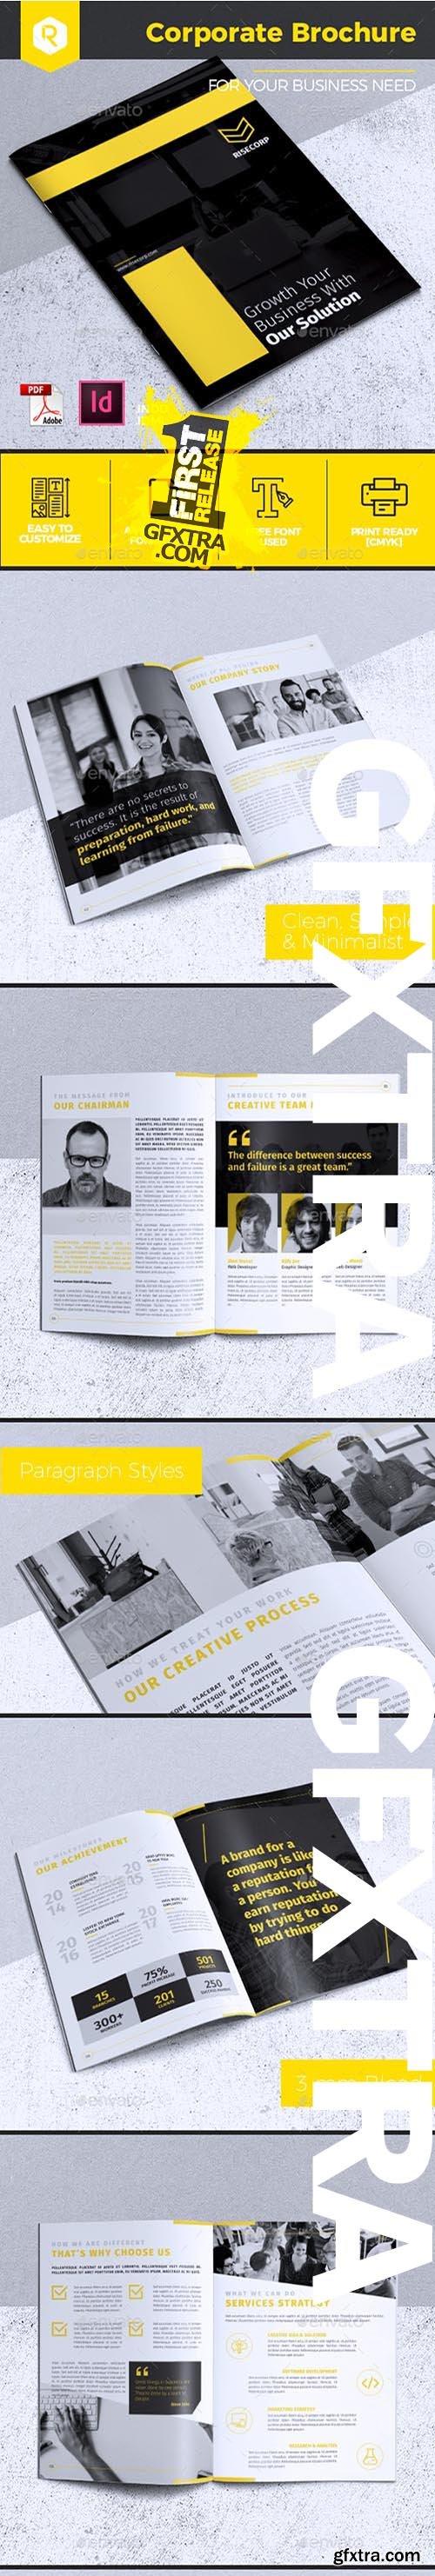 Creative Corporate Brochure Vol. 27 20276926